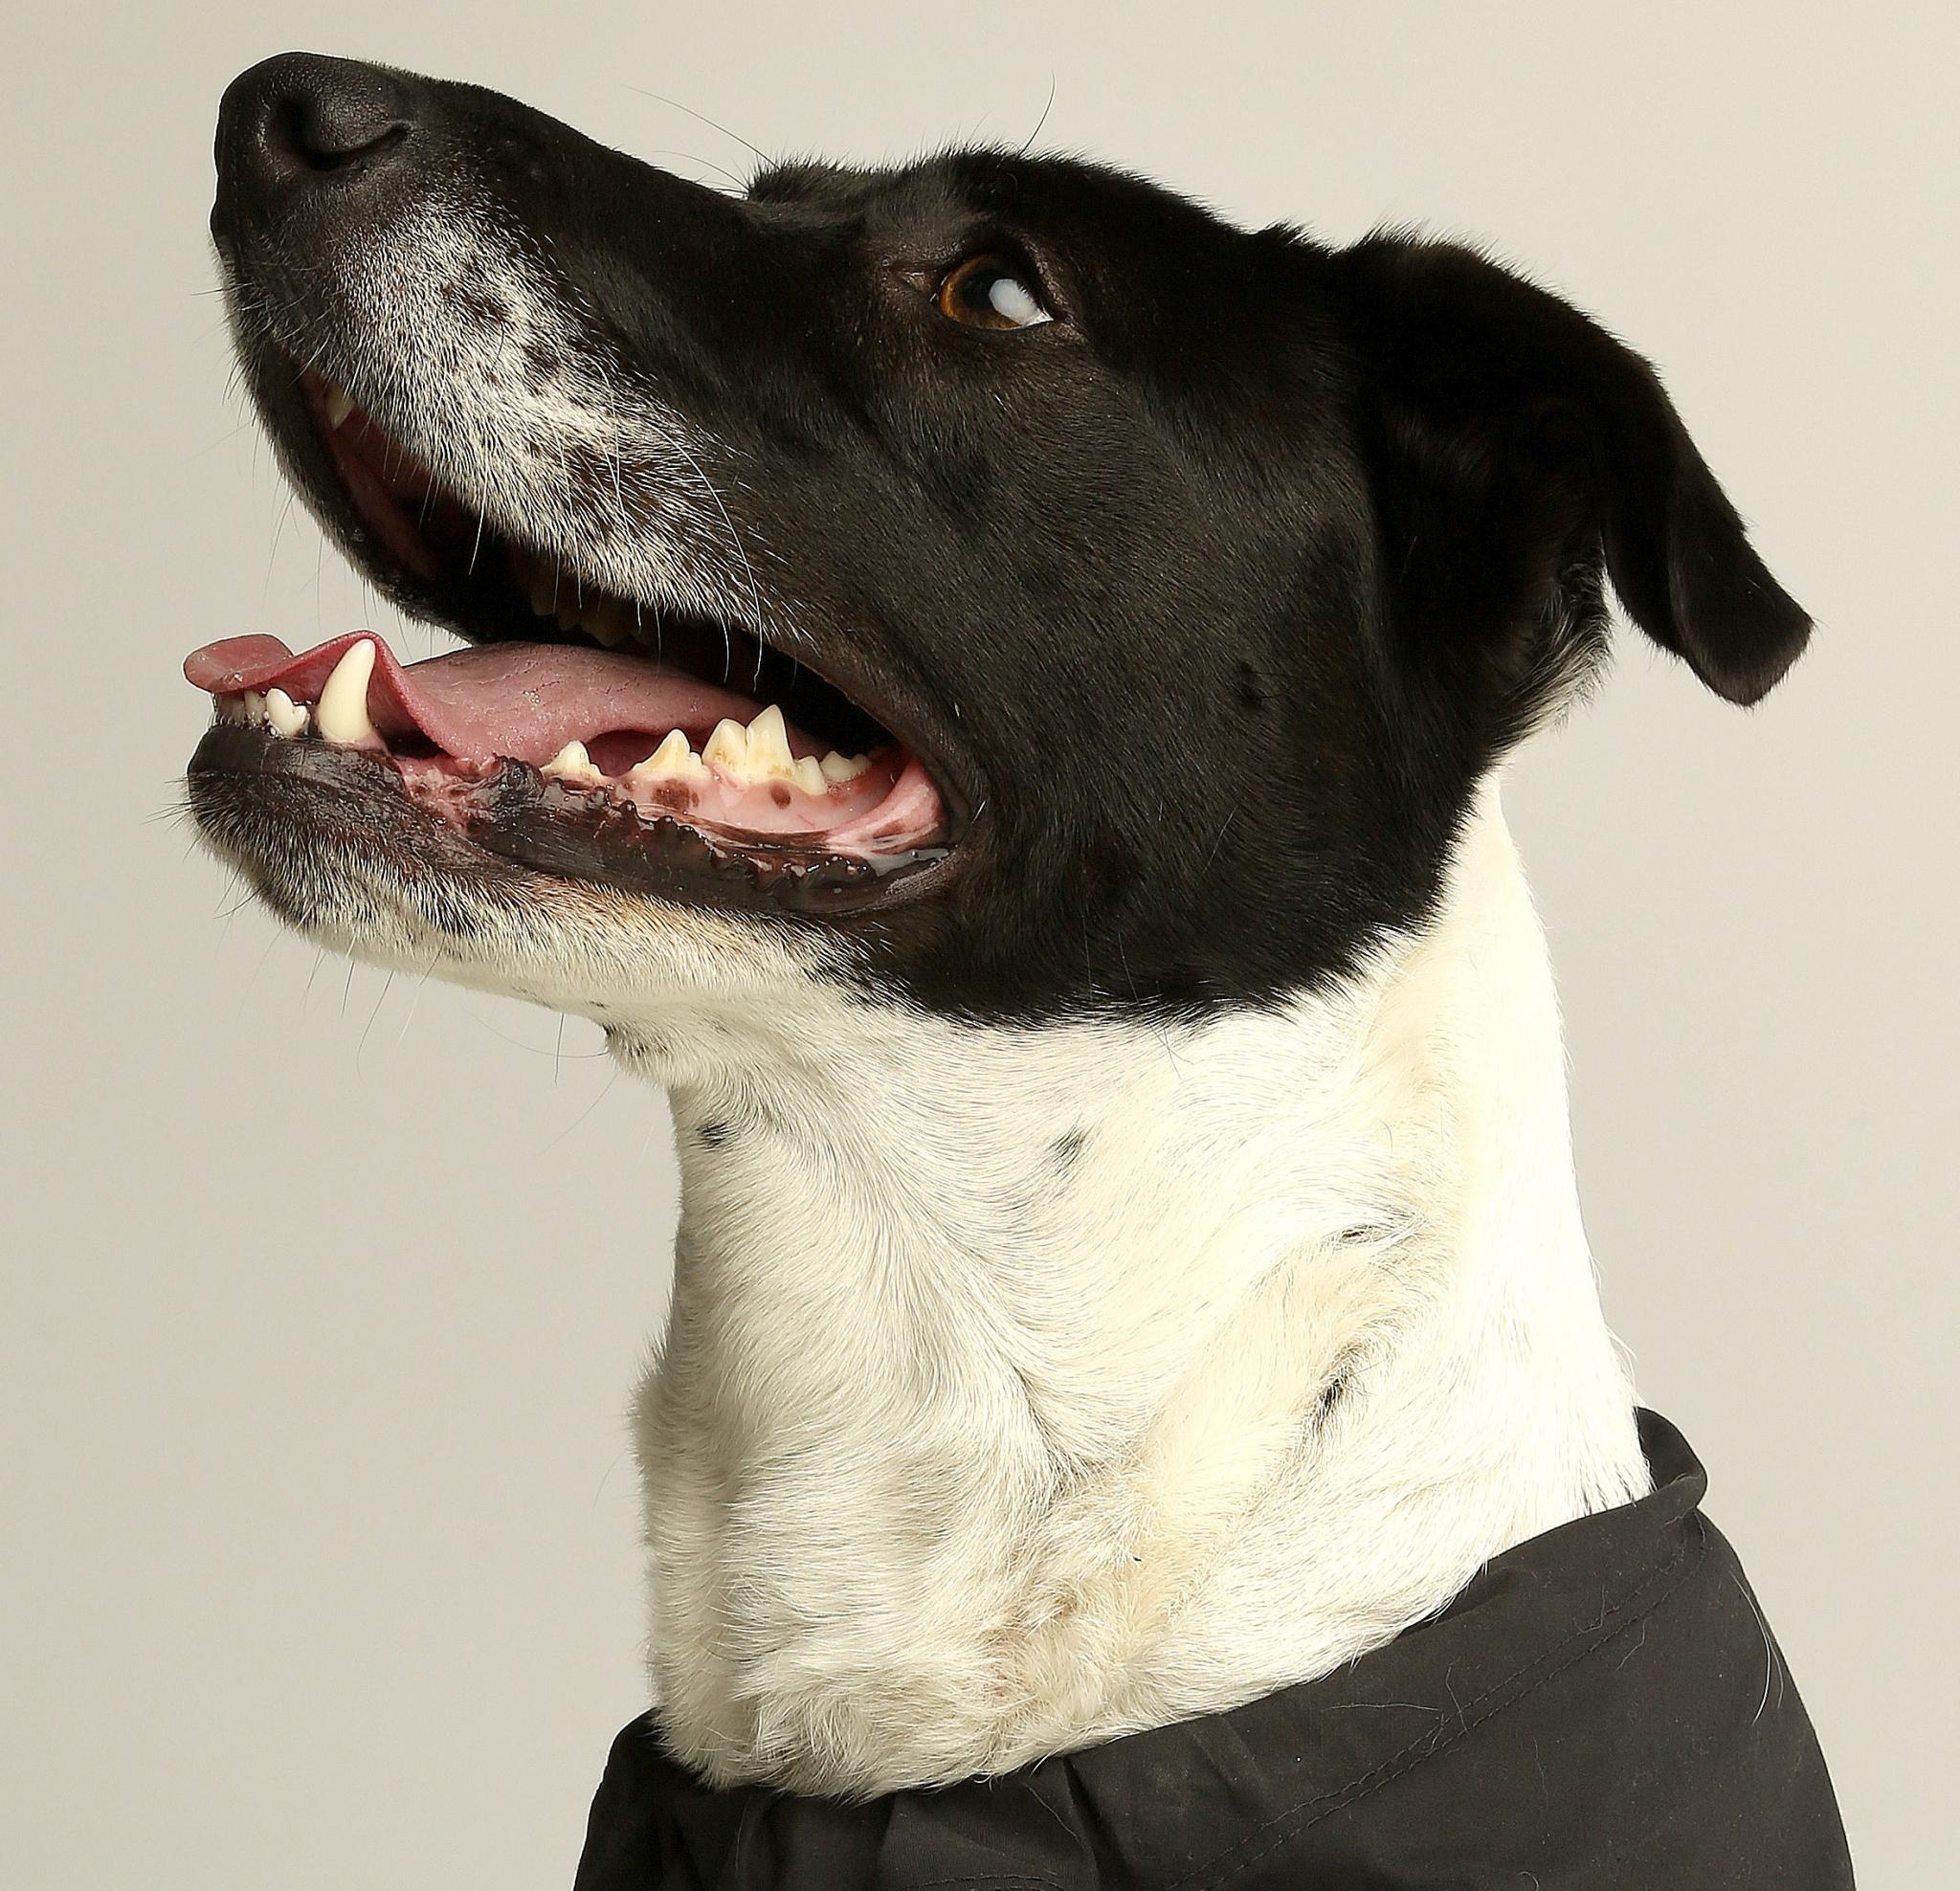 Www Apartmentrentals Com: Texas Cities Dominate For Pet Friendly Apartment Rentals